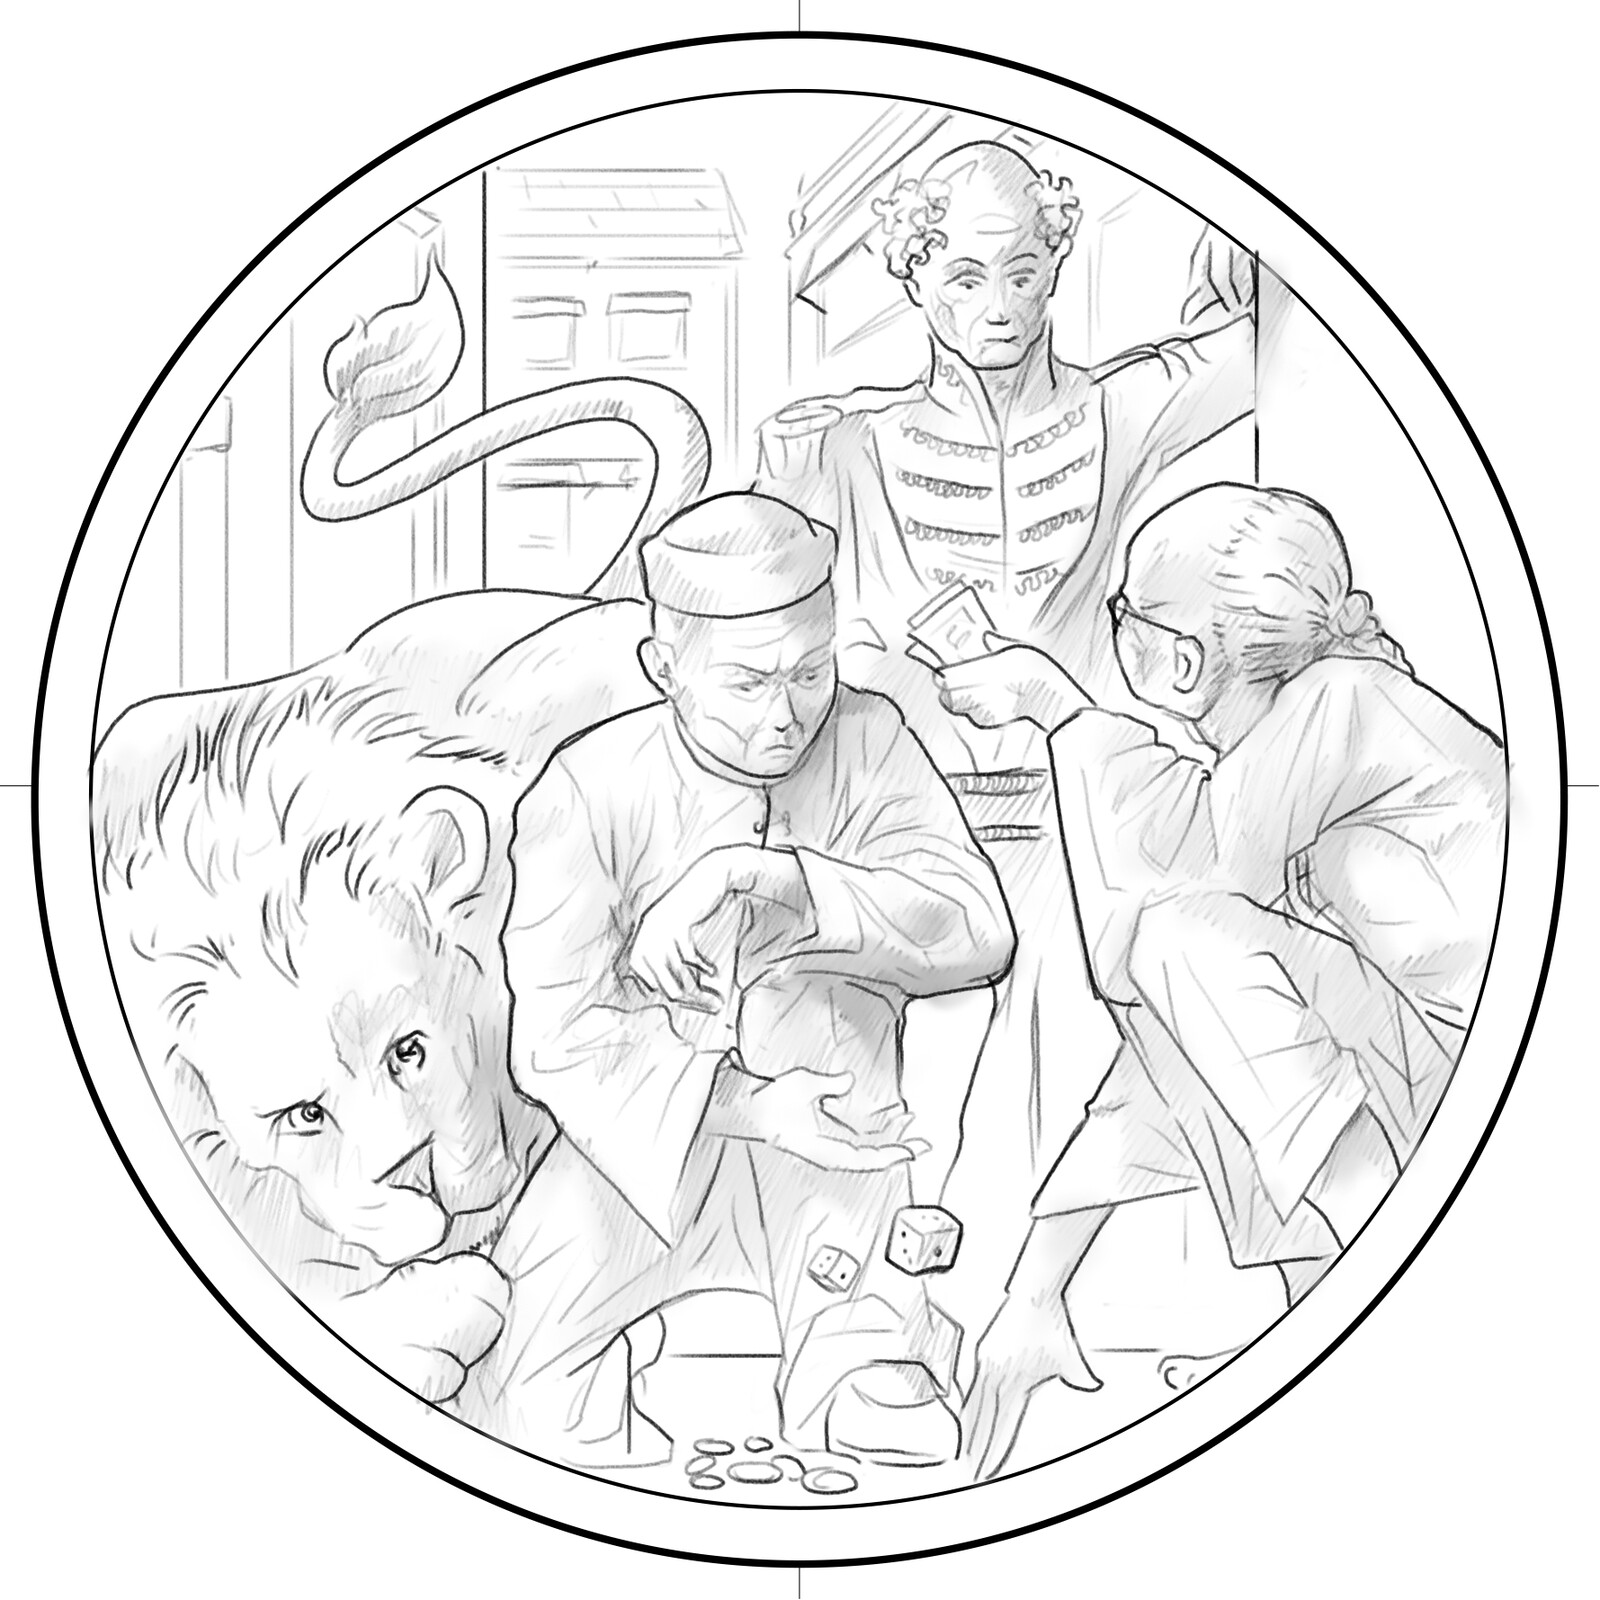 Sketch - 'Gambling'